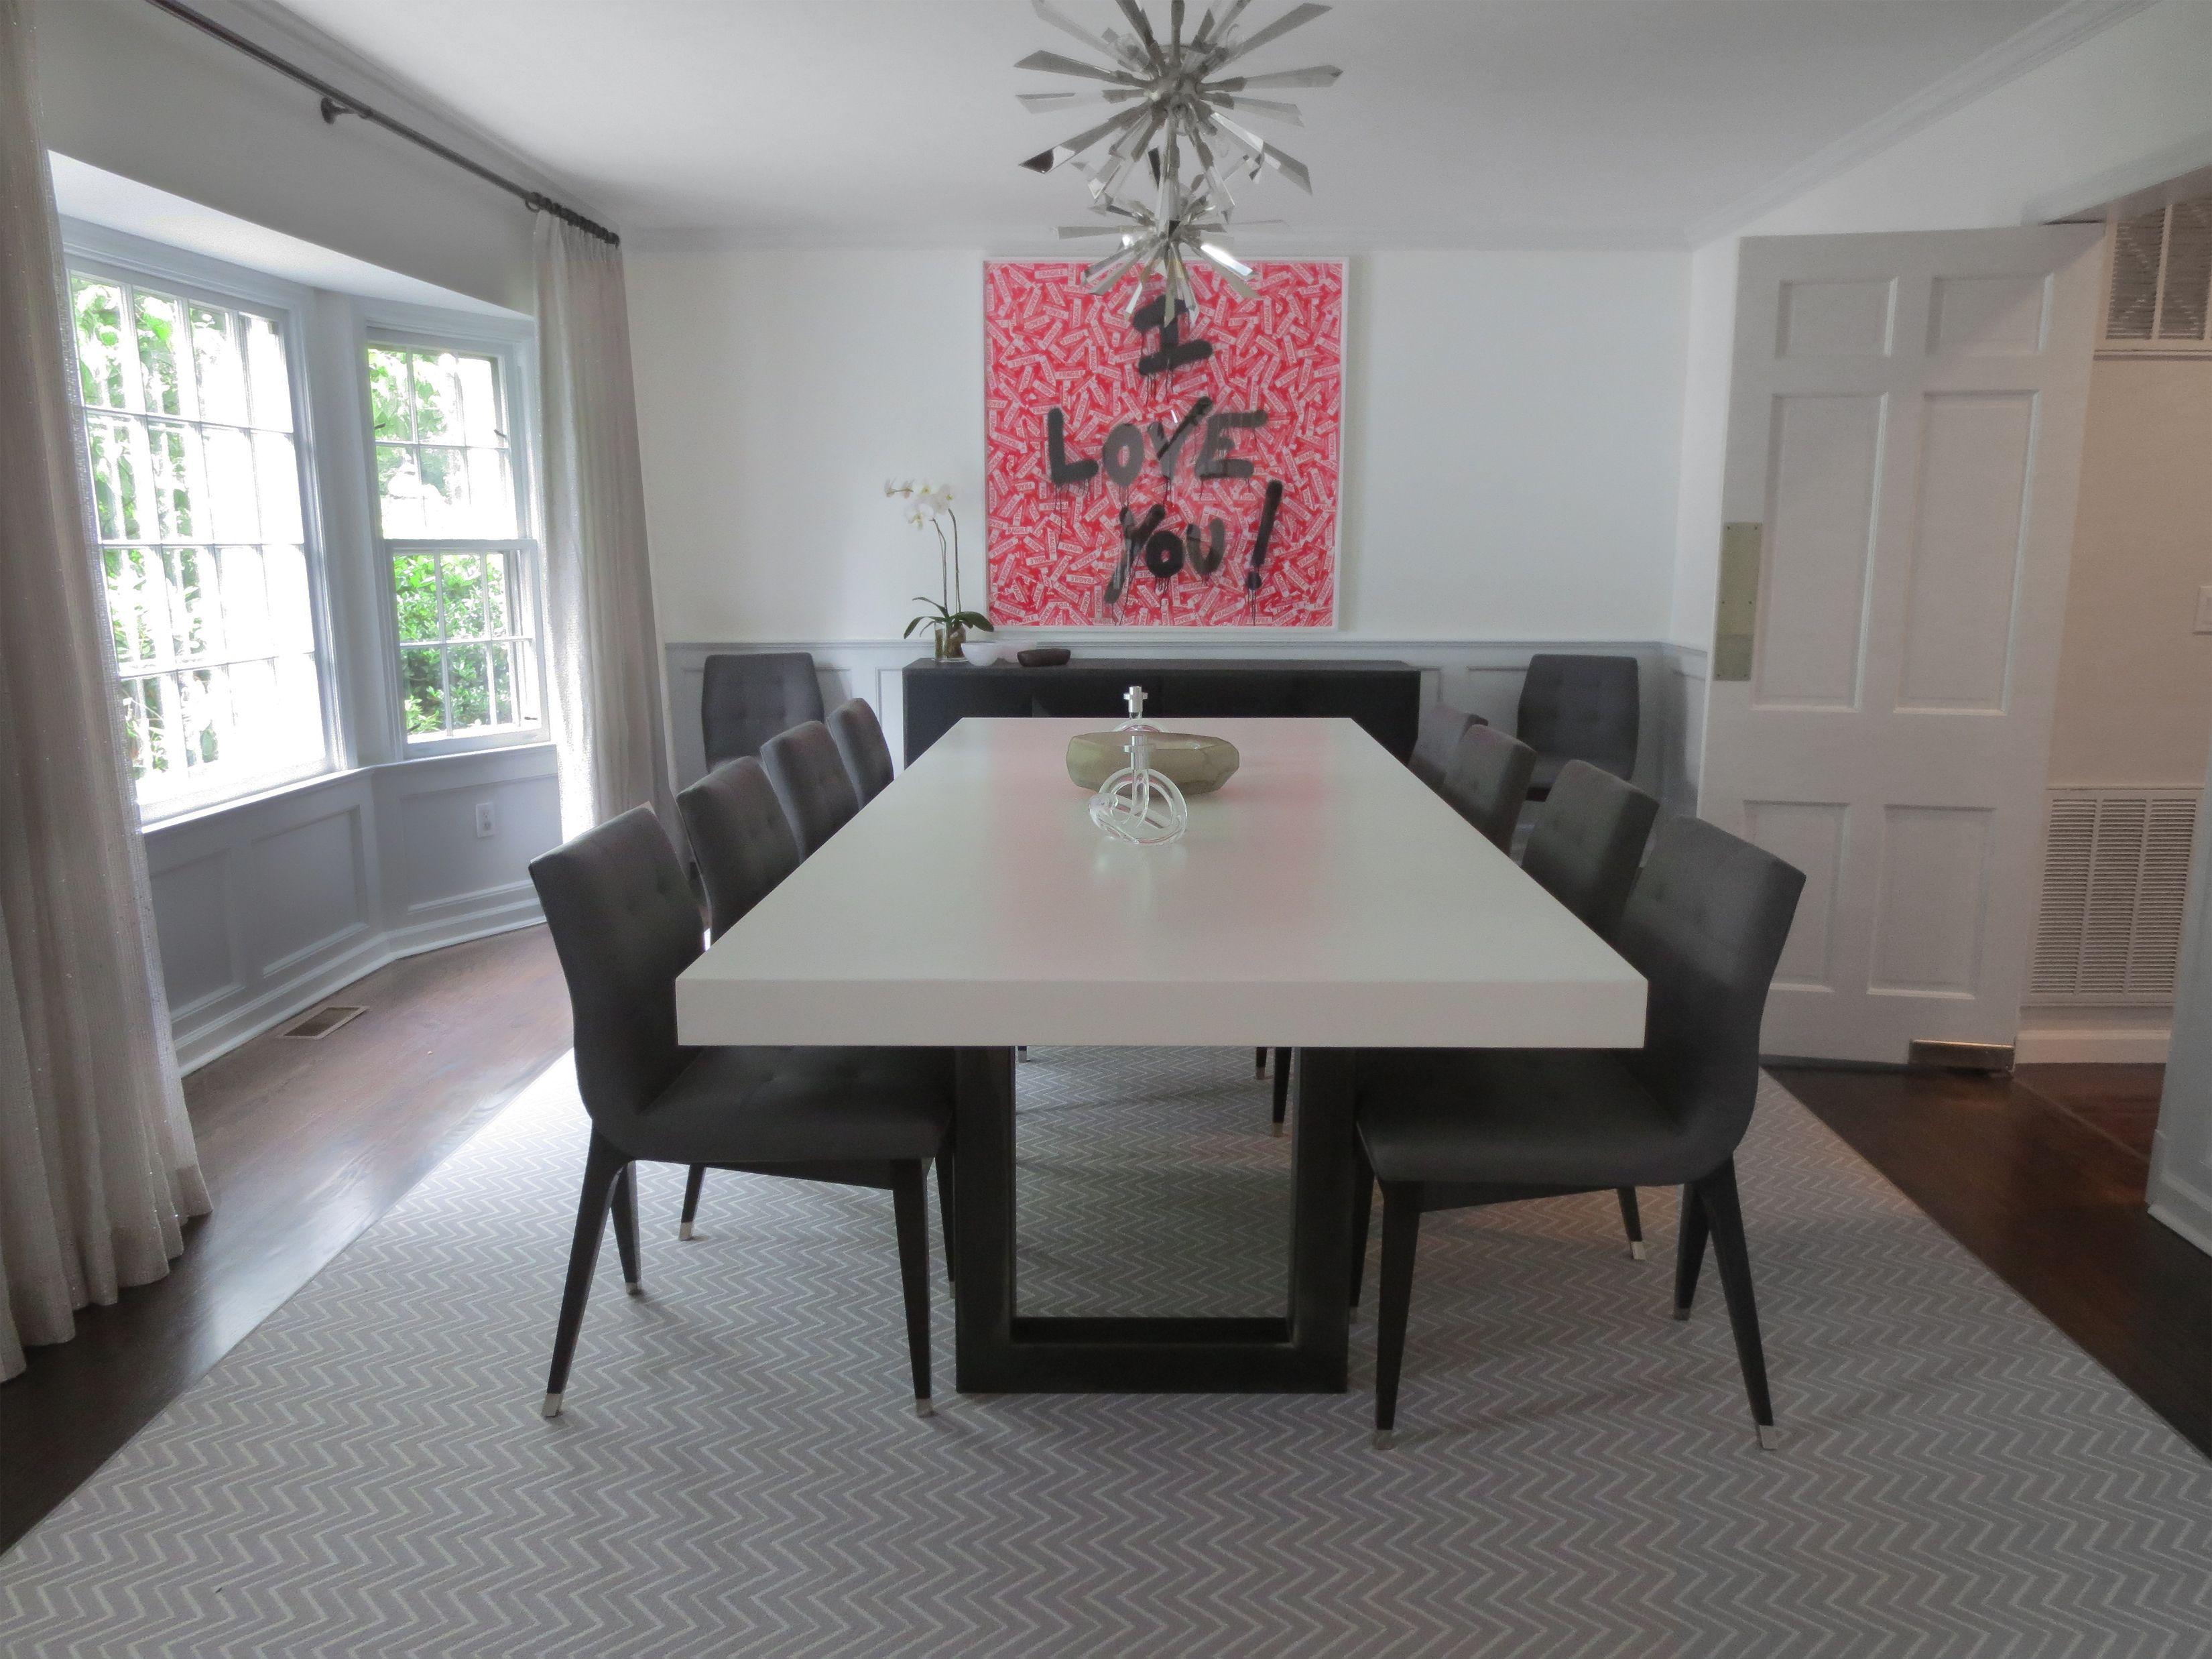 custom concrete kitchen dining tables trueform con concrete kitchen table White Concrete Zen Dining Table by Trueform Concrete